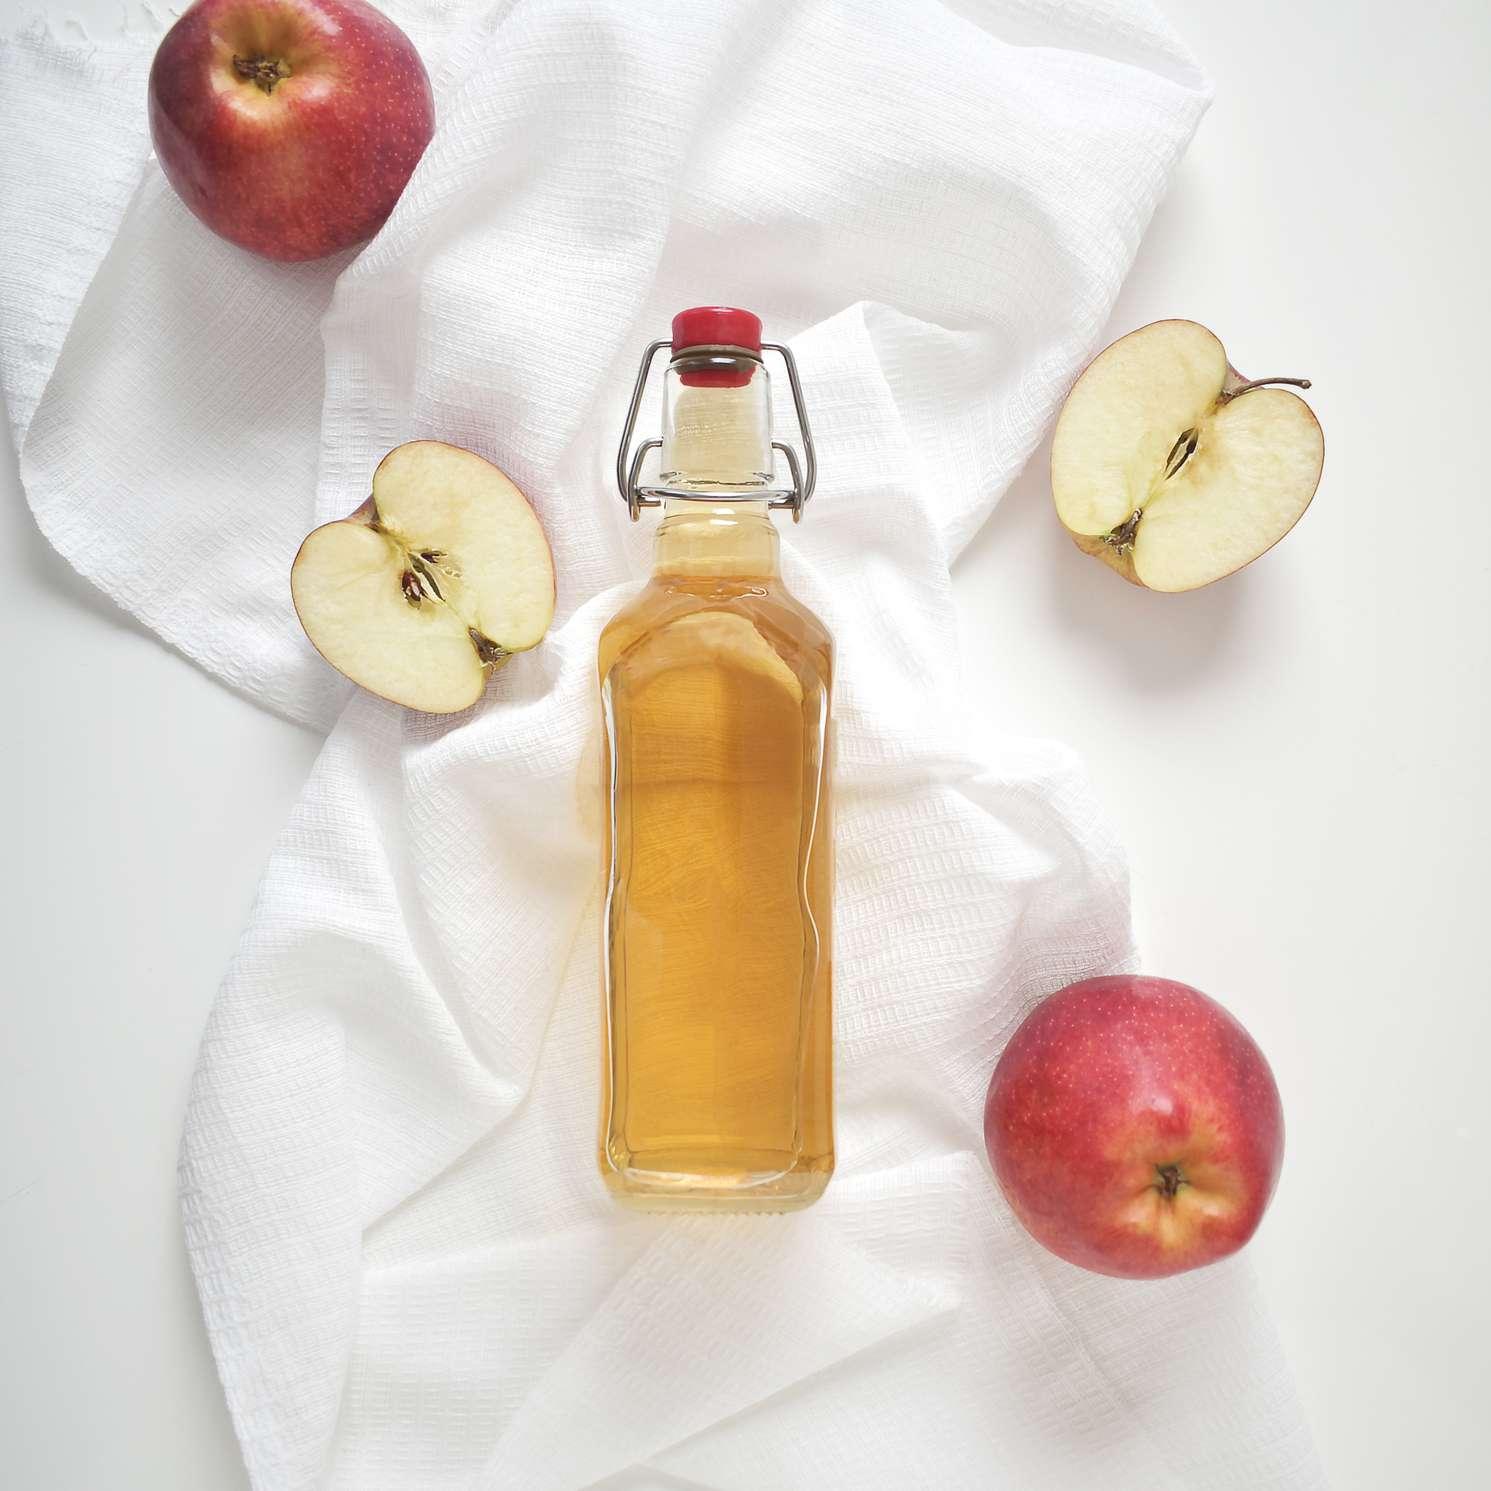 Apple cider vinegar or fermented fruit drink and organic apples on white